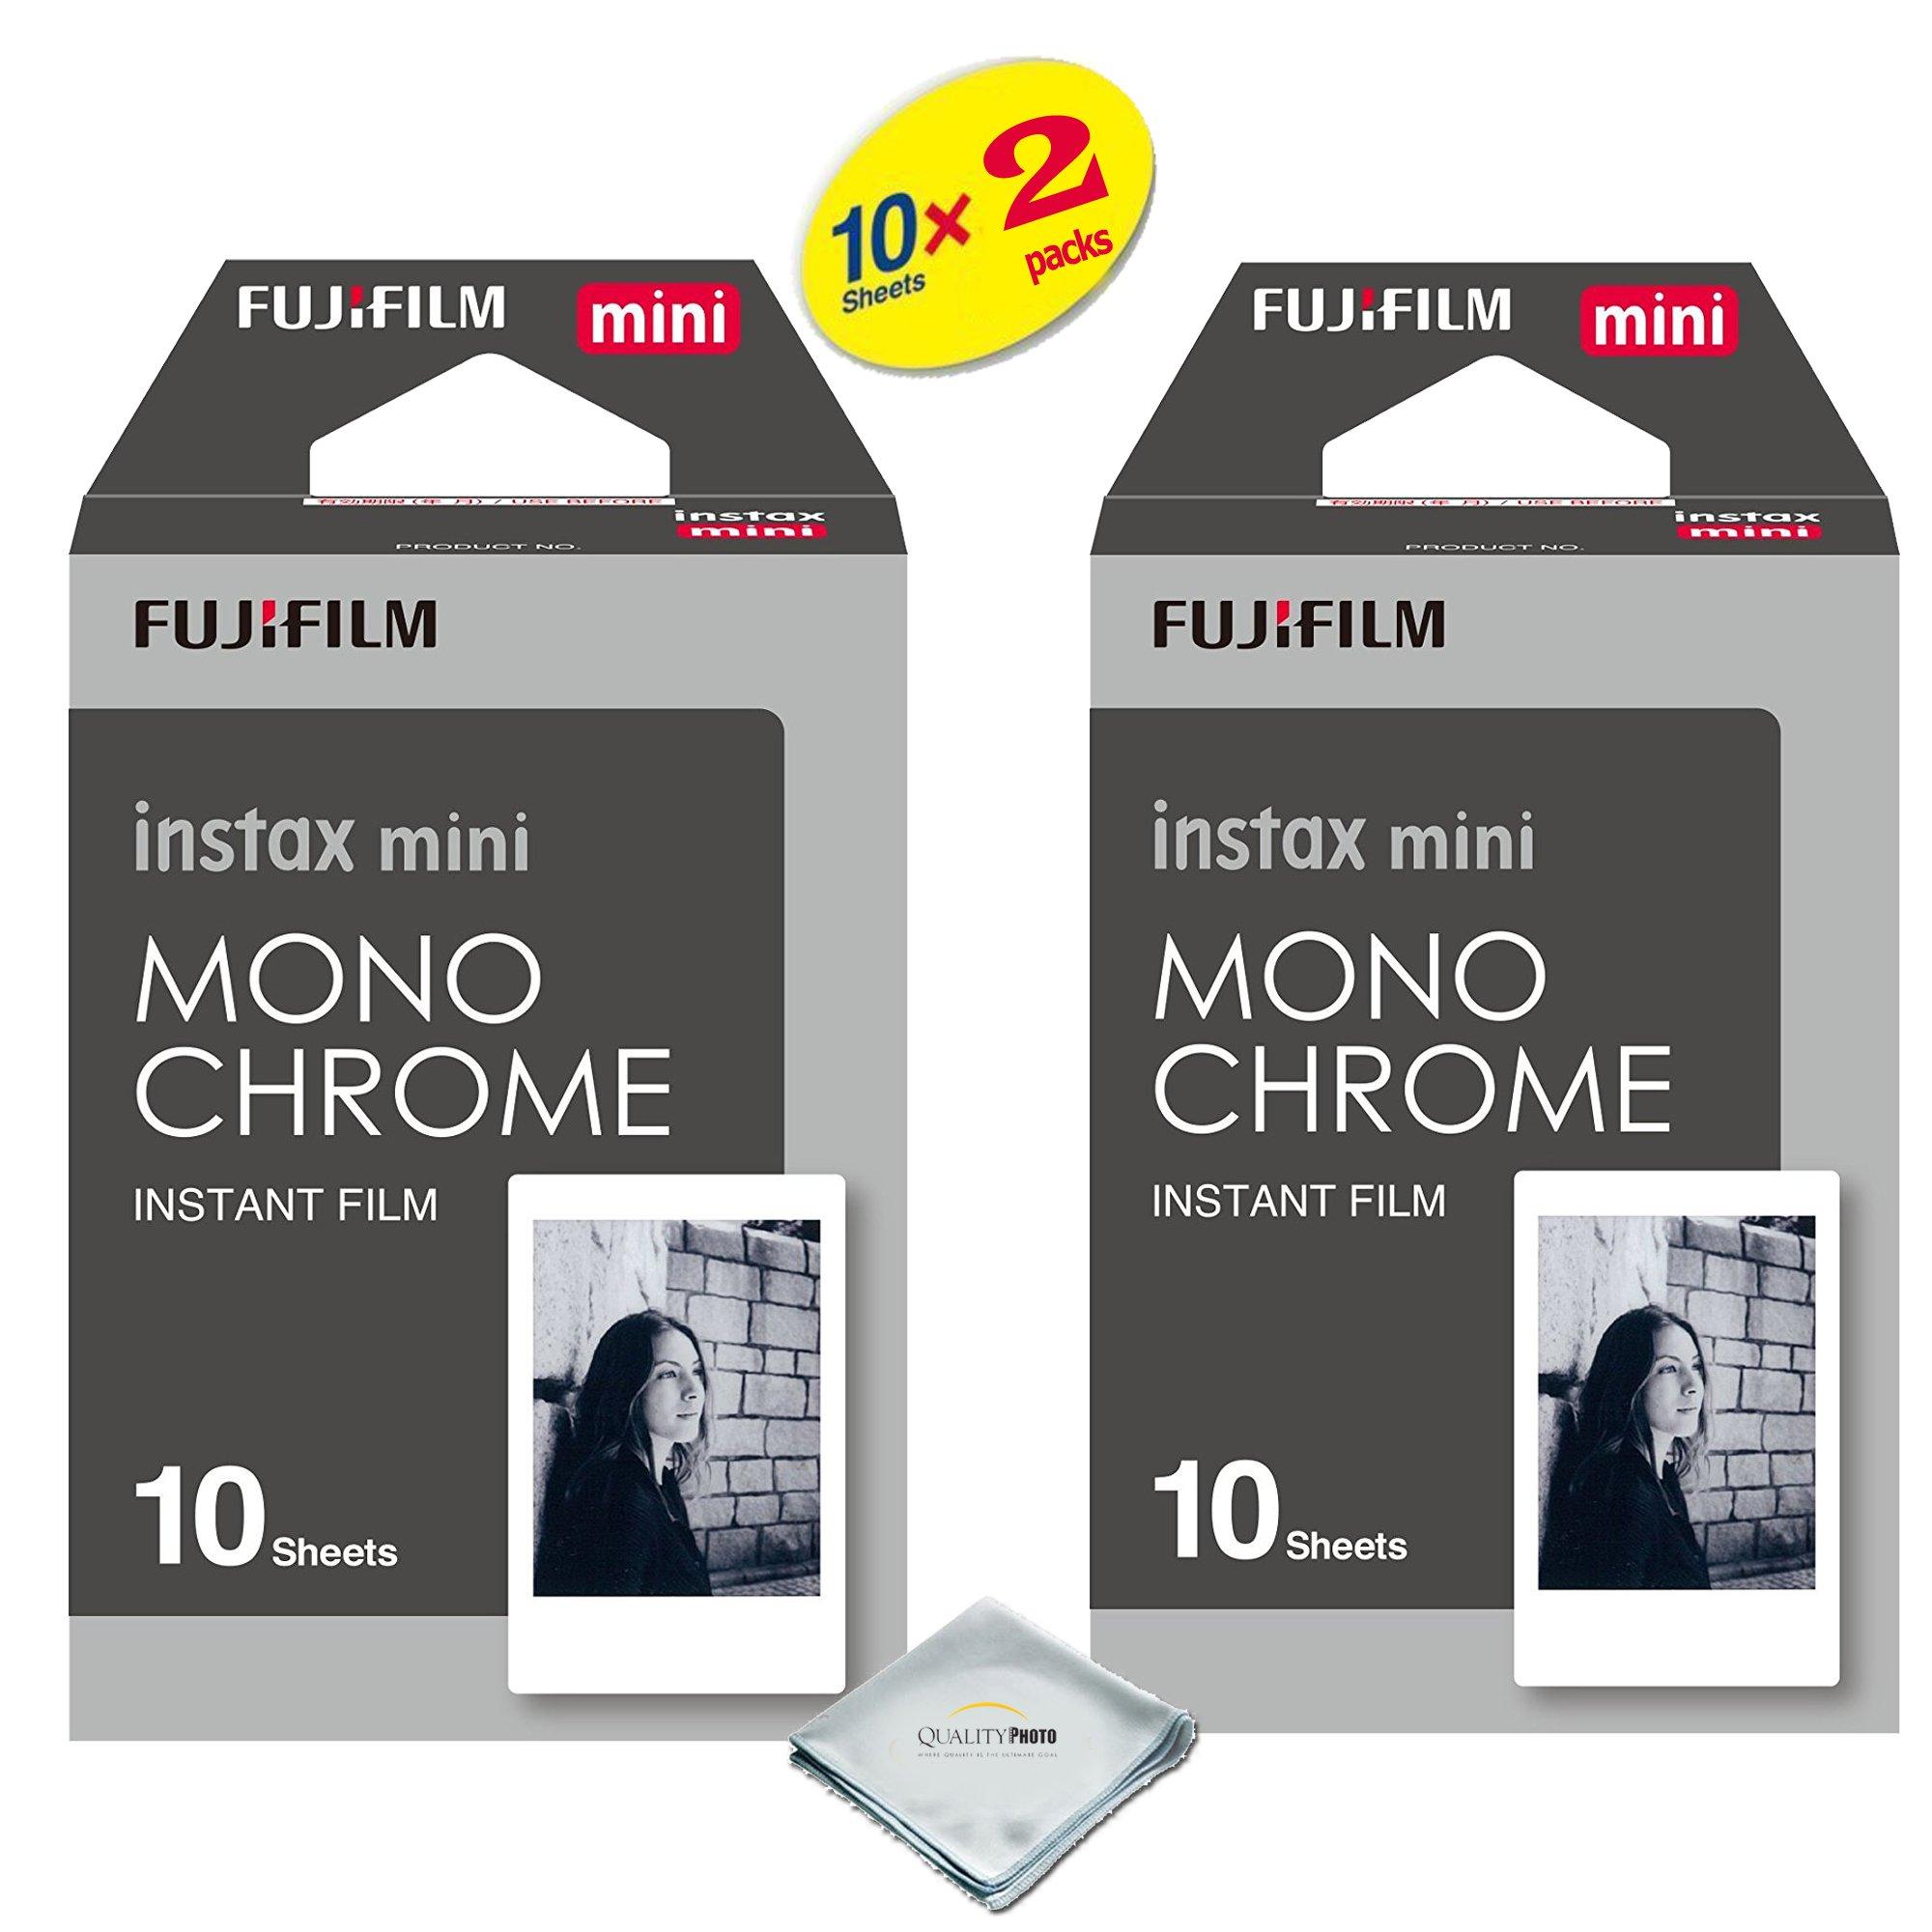 Fujifilm Instax Mini 8 & mini 9 Instant Film 2-PACK (20 Sheets) Value set For Fujifilm Instax Mini 8 & mini 9 Cameras - Monochrome … by Quality photo